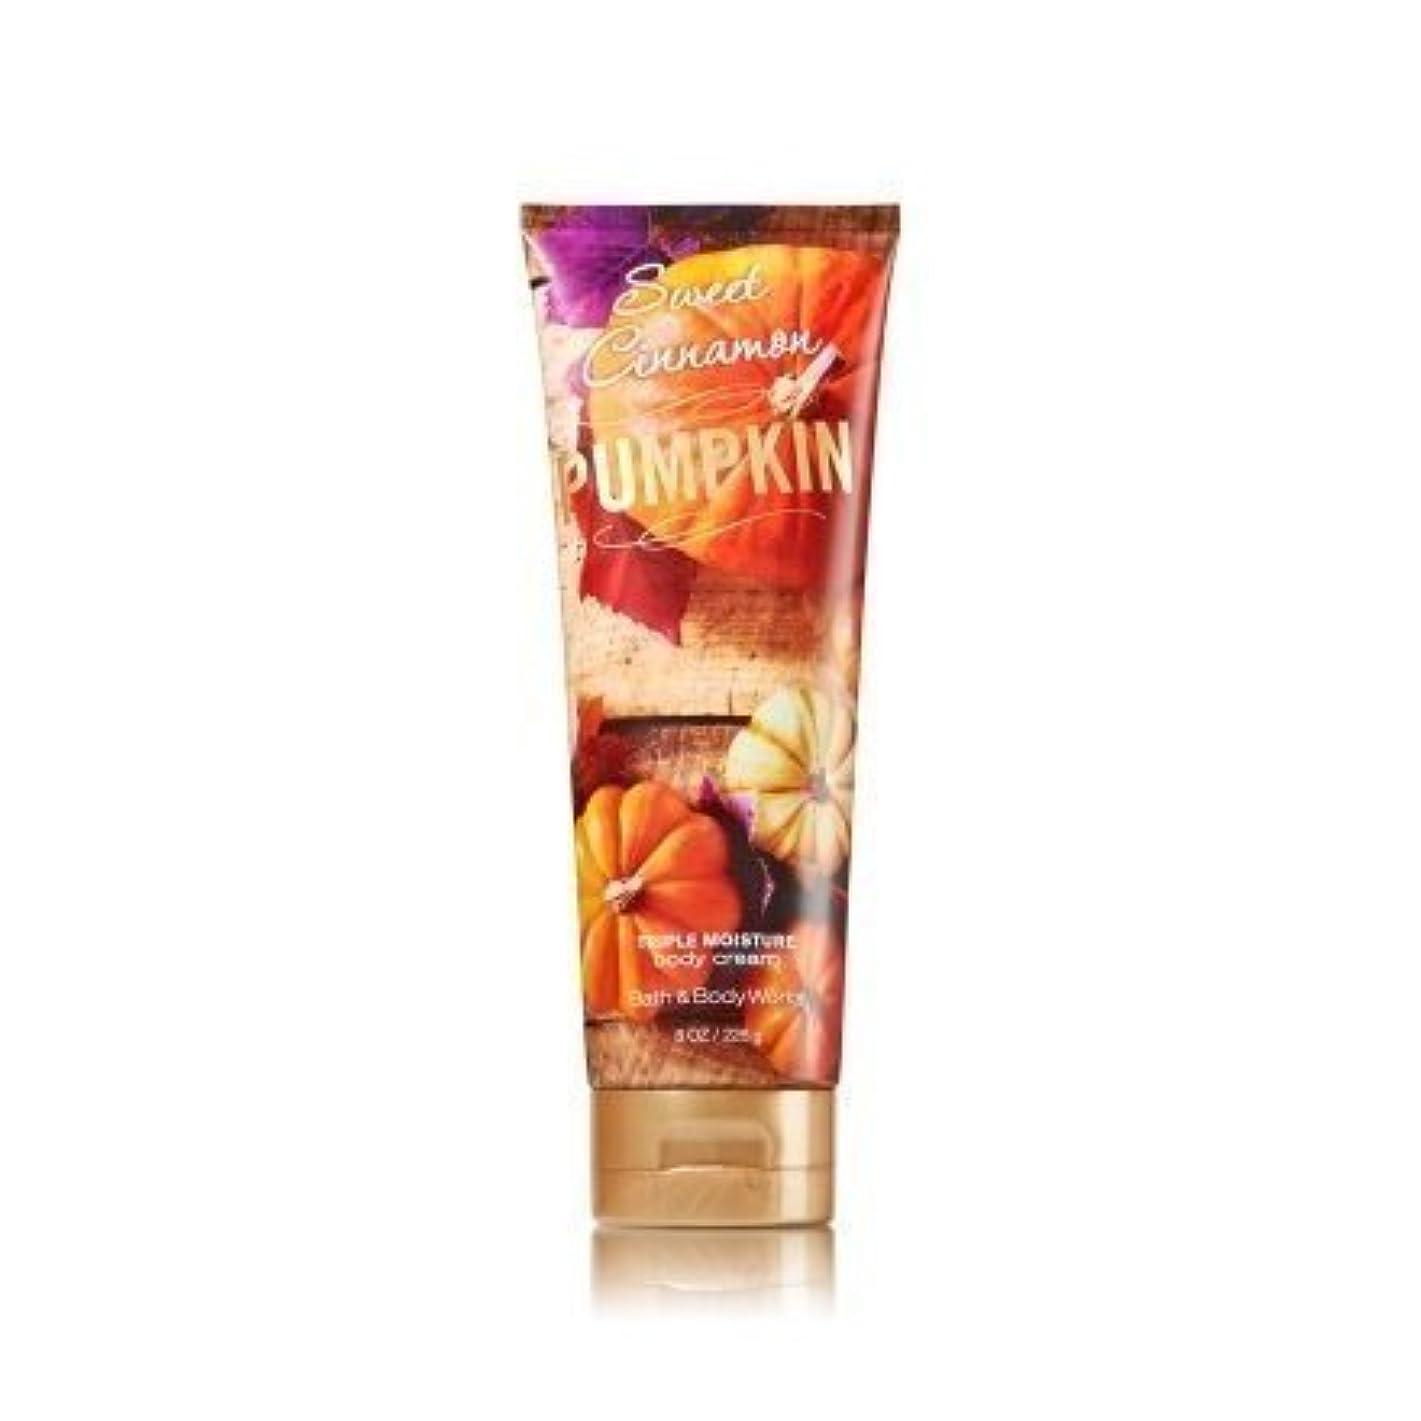 Bath & Body Works Sweet Cinnamon Pumpkin Triple Moisture Body Cream 8 Oz 2014